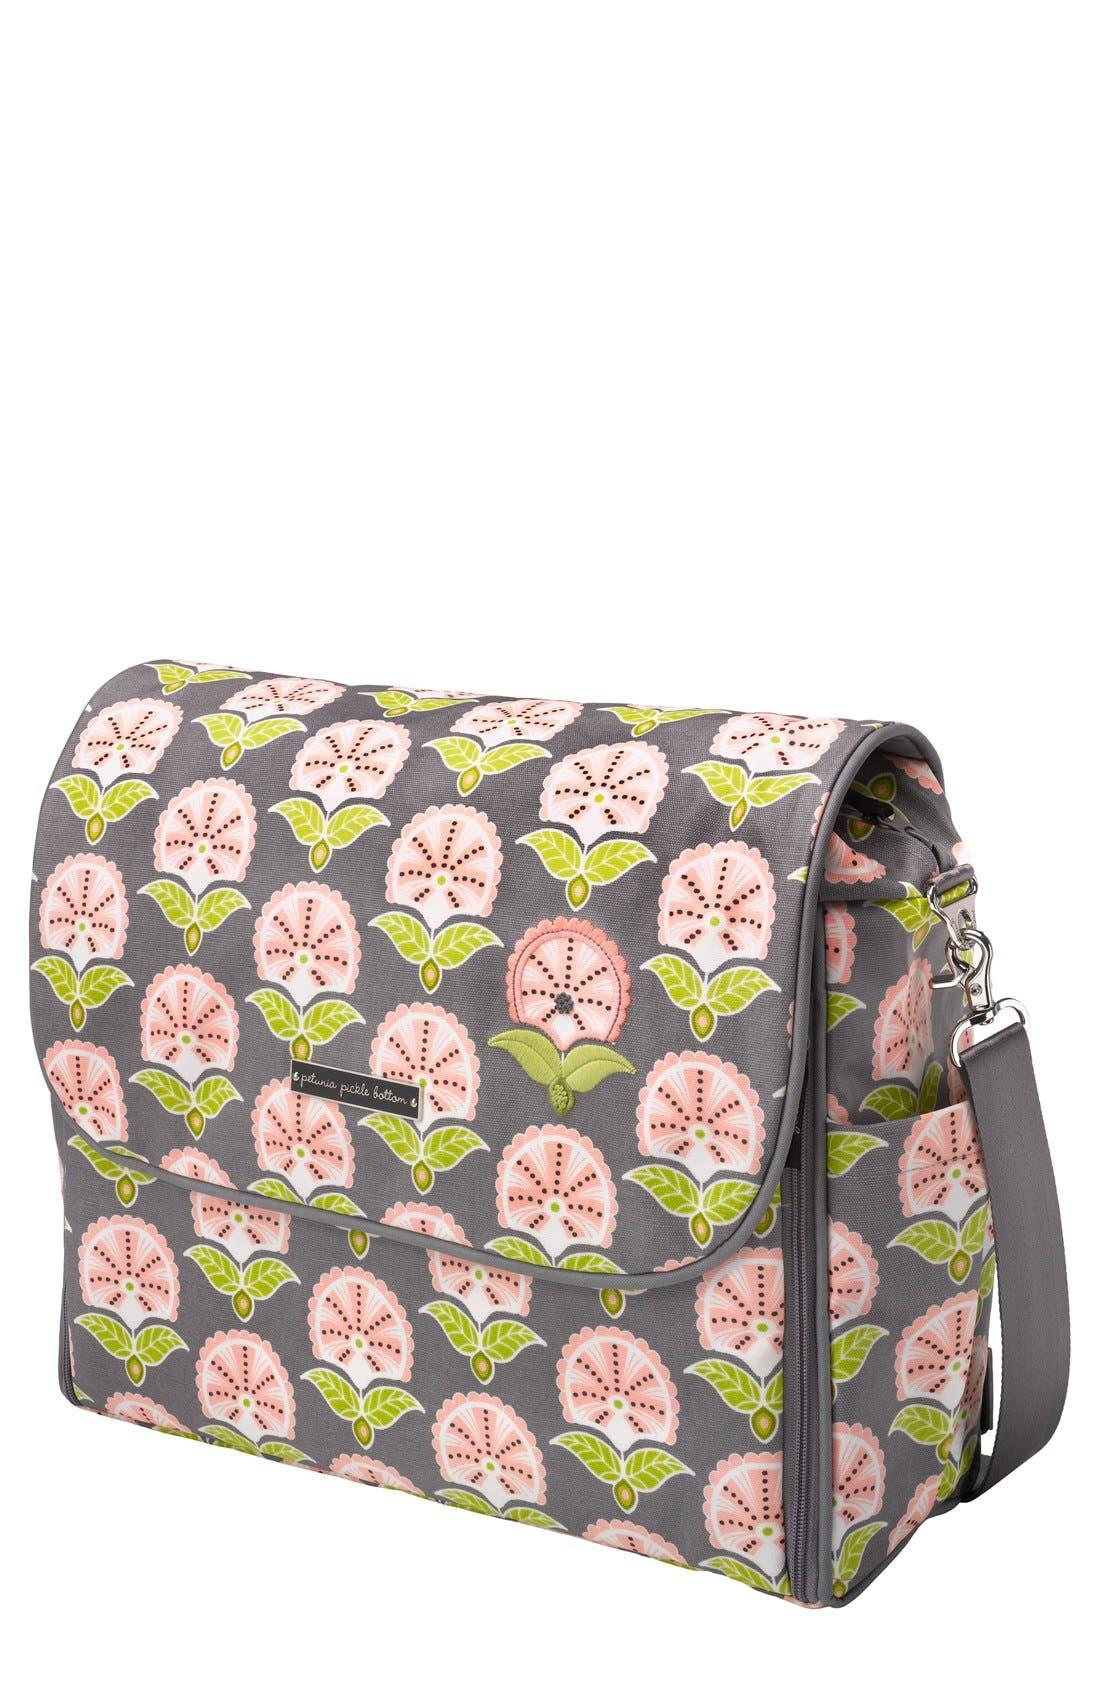 Alternate Image 1 Selected - Petunia Pickle Bottom 'Glazed Abundance' Boxy Diaper Backpack